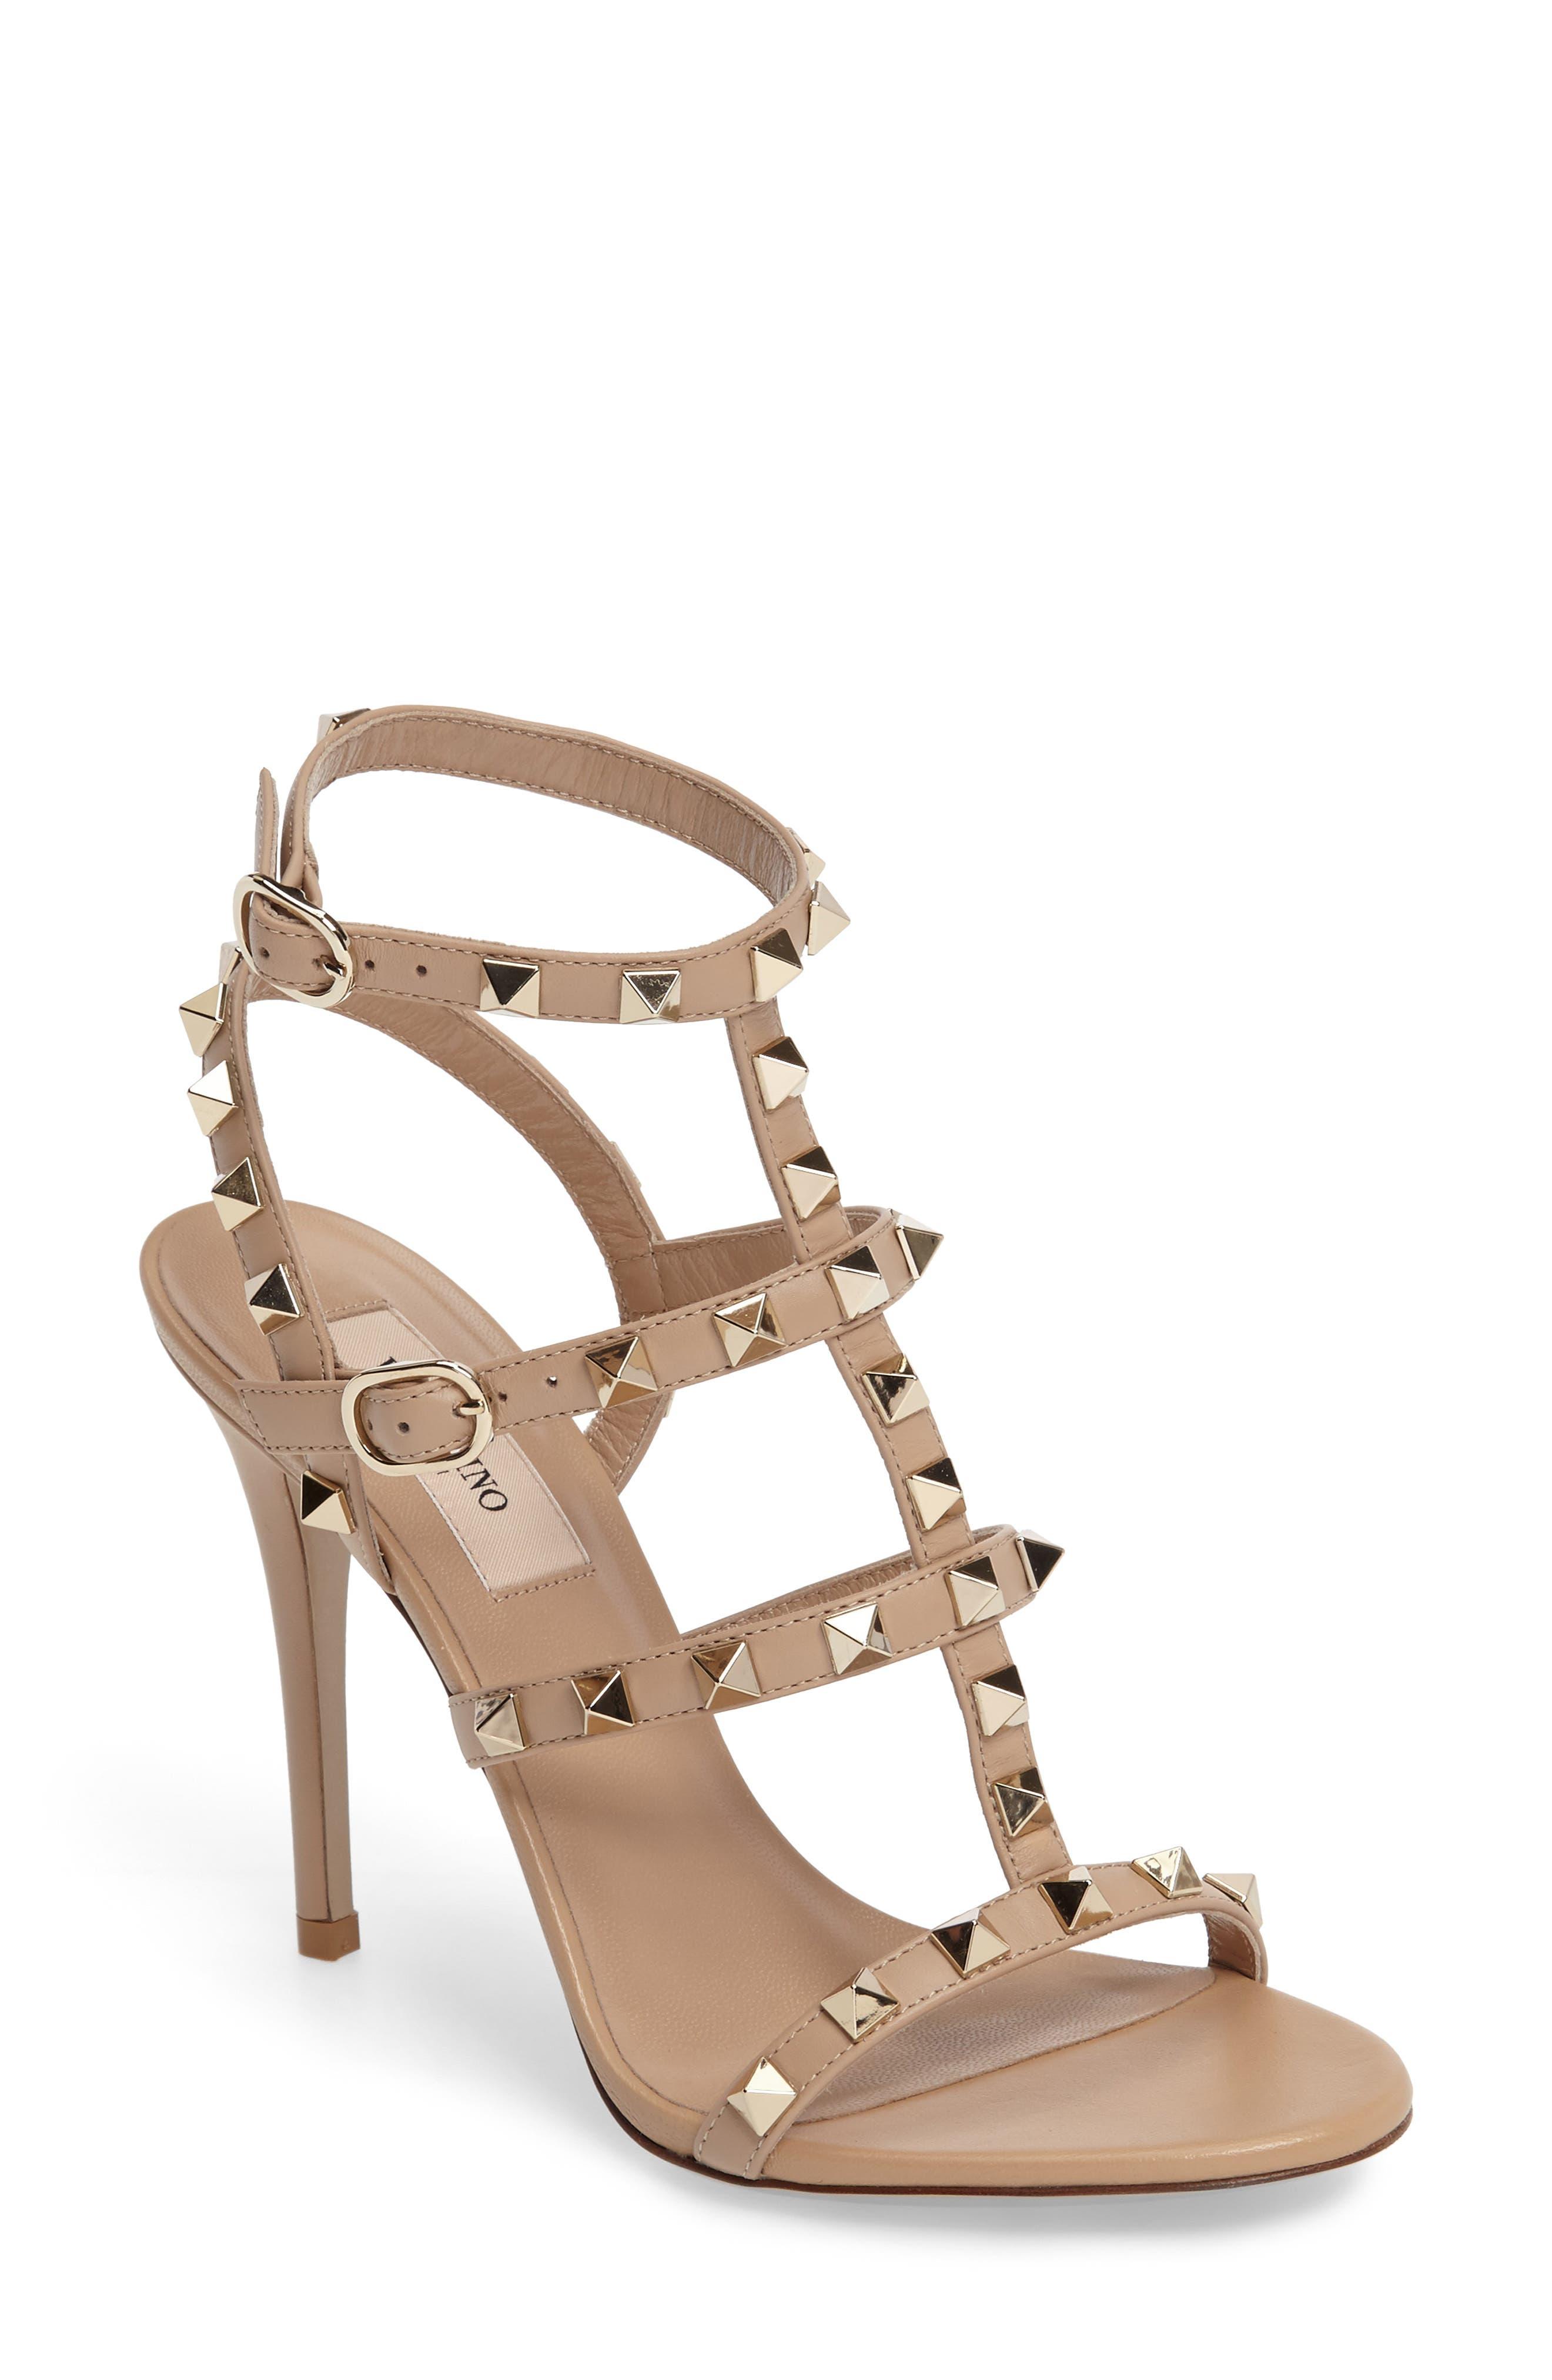 Alternate Image 1 Selected - Valentino 'Rockstud' Ankle Strap Sandal (Women)